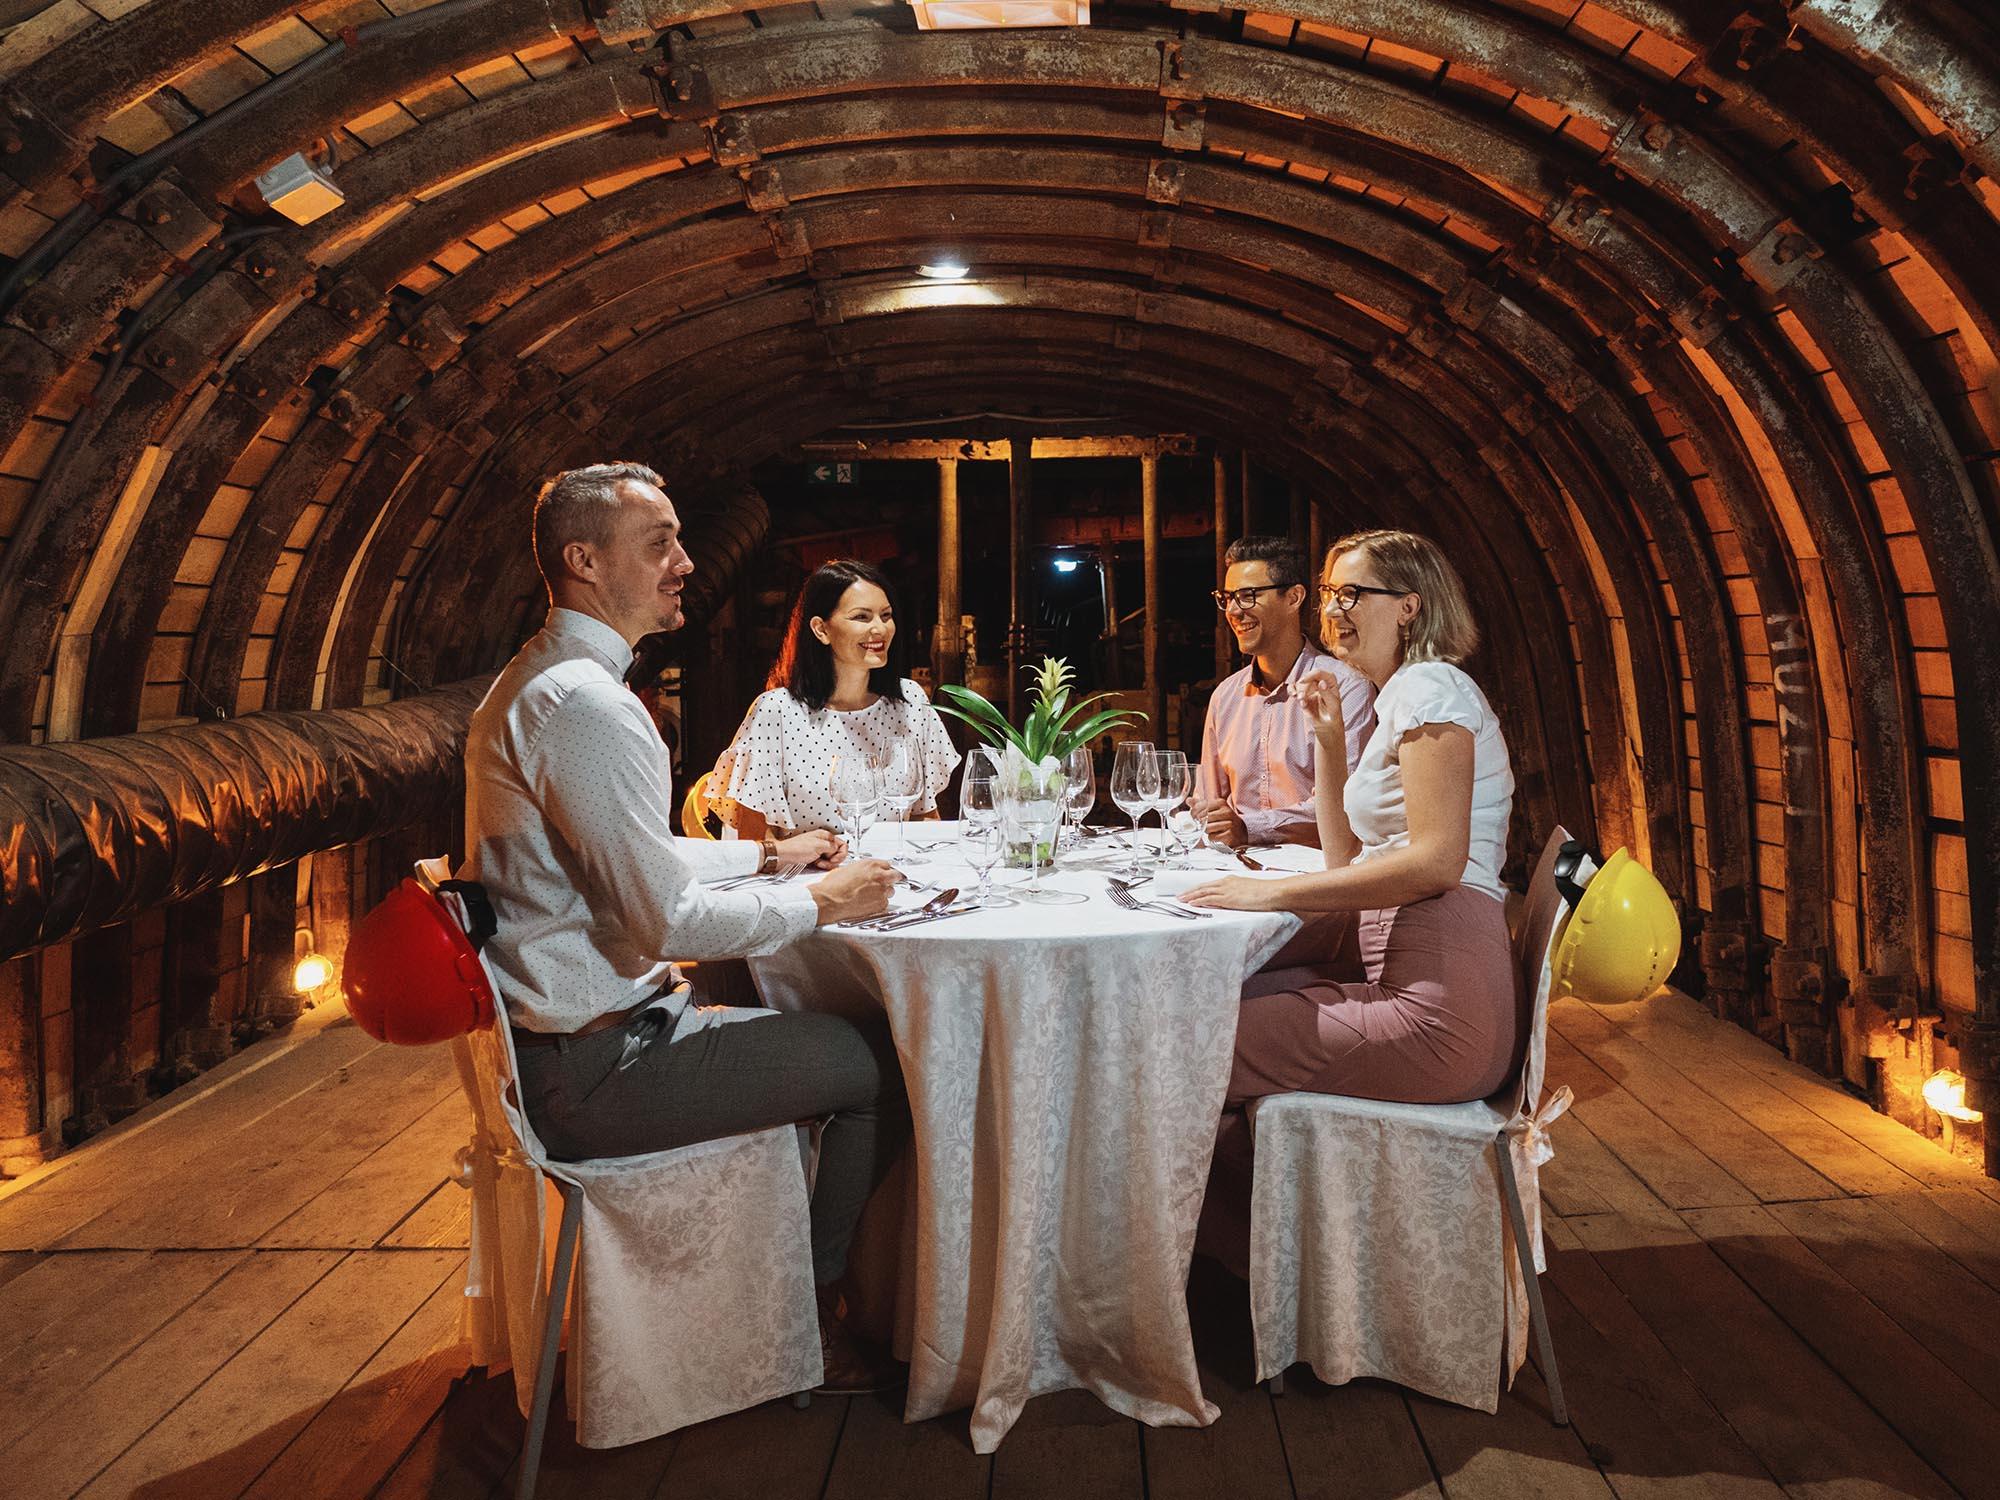 Dinner at 160 metres below ground